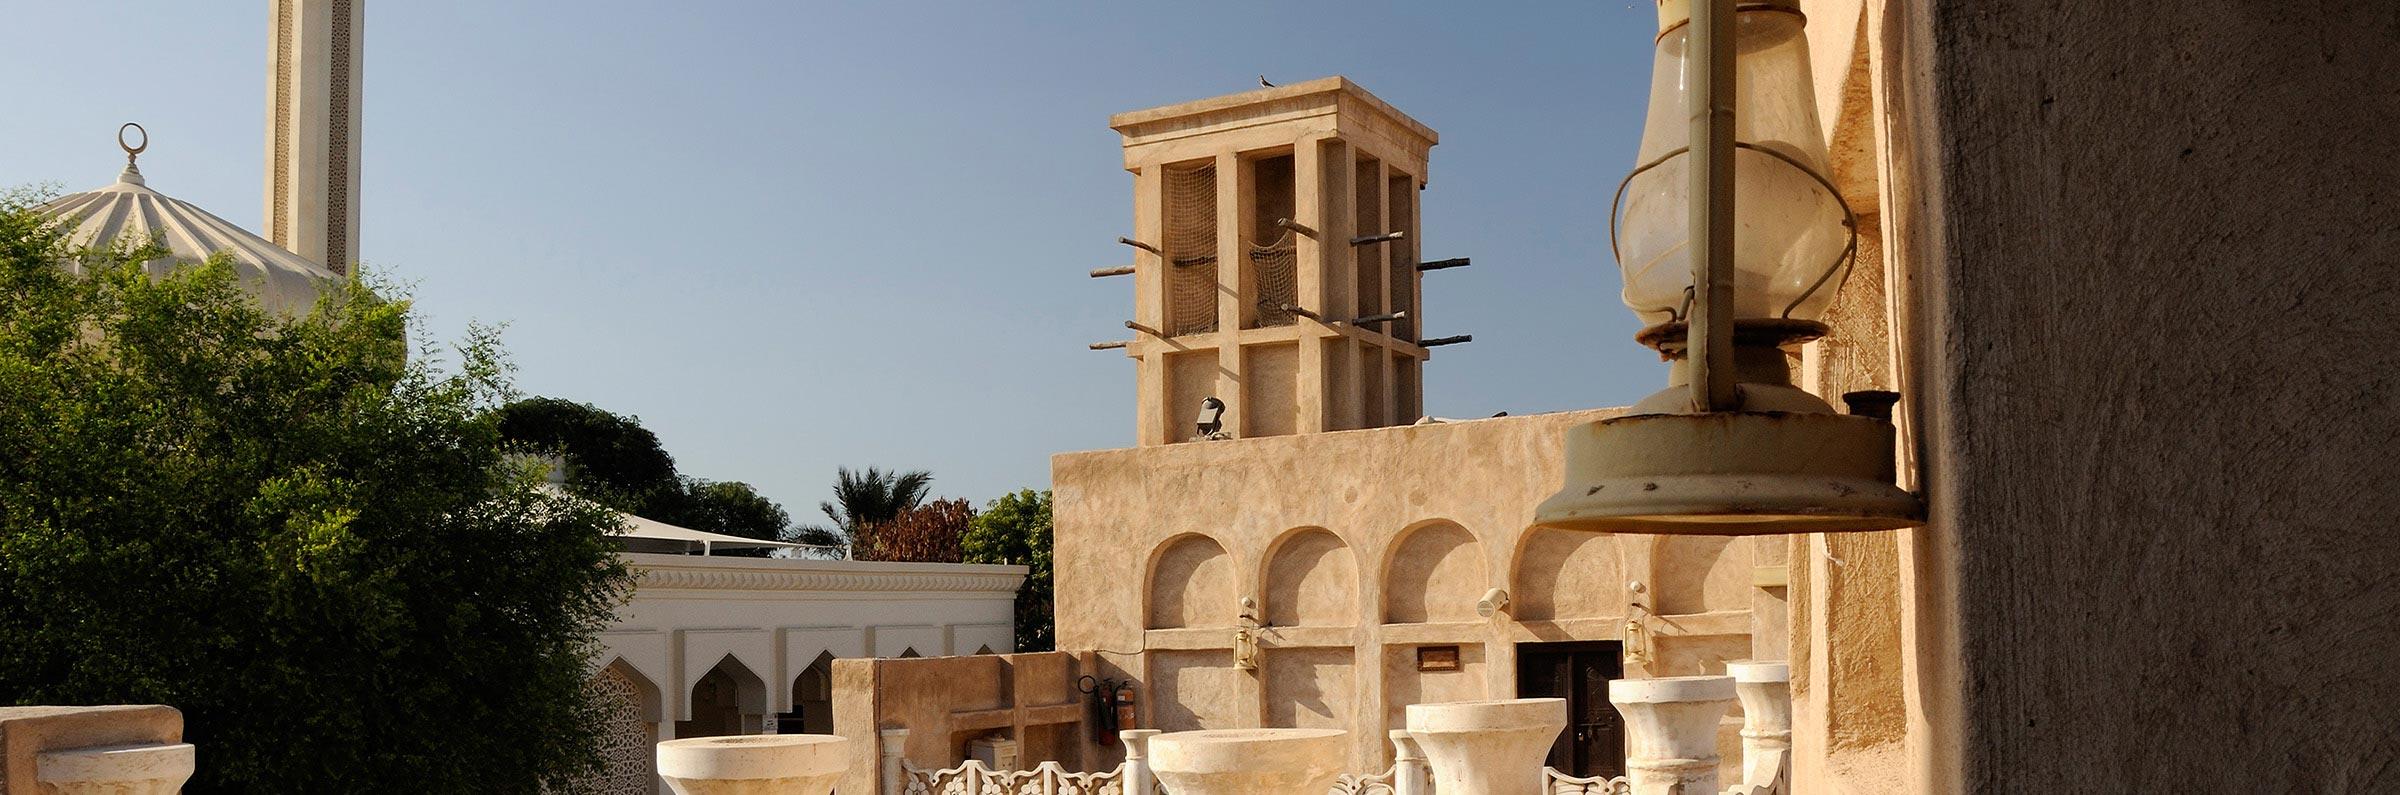 Art and culture in Dubai